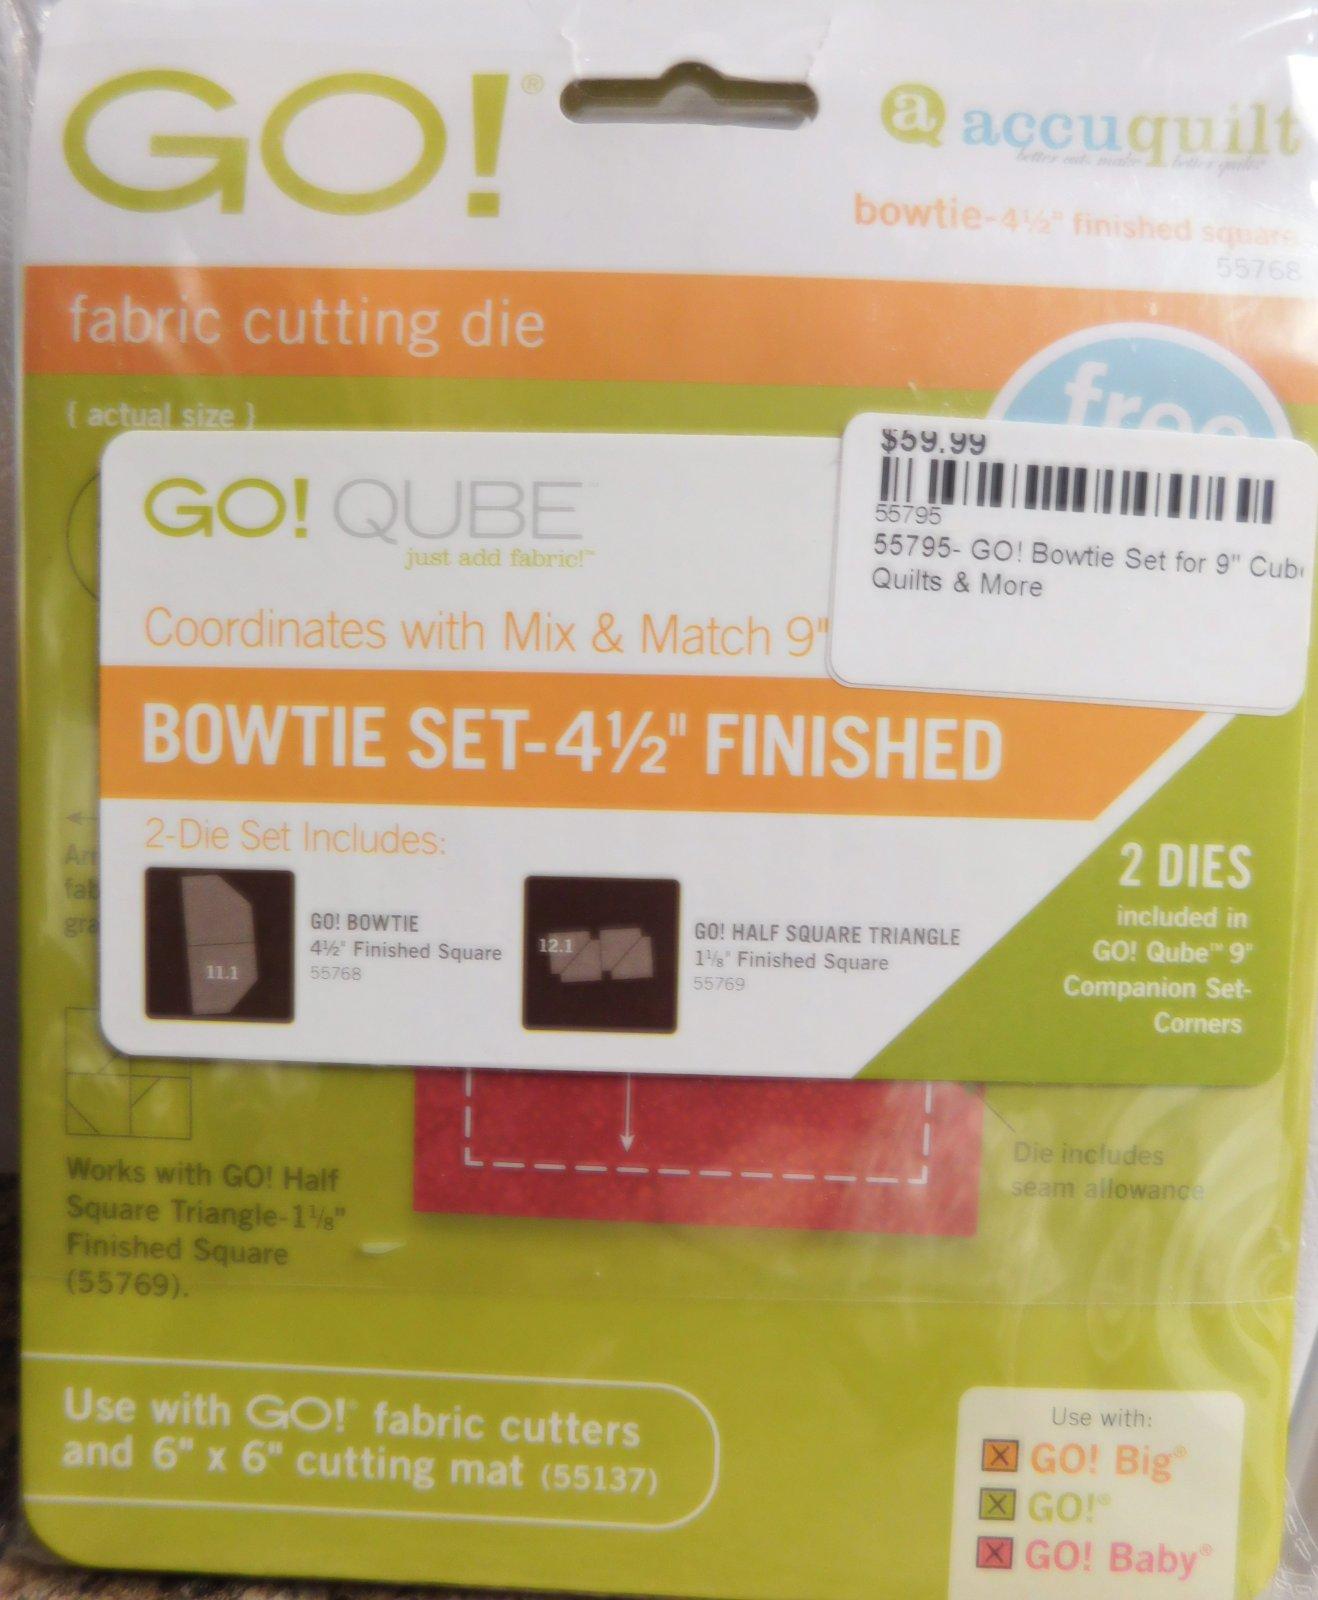 55795- GO! Bowtie Set for 9 Cube